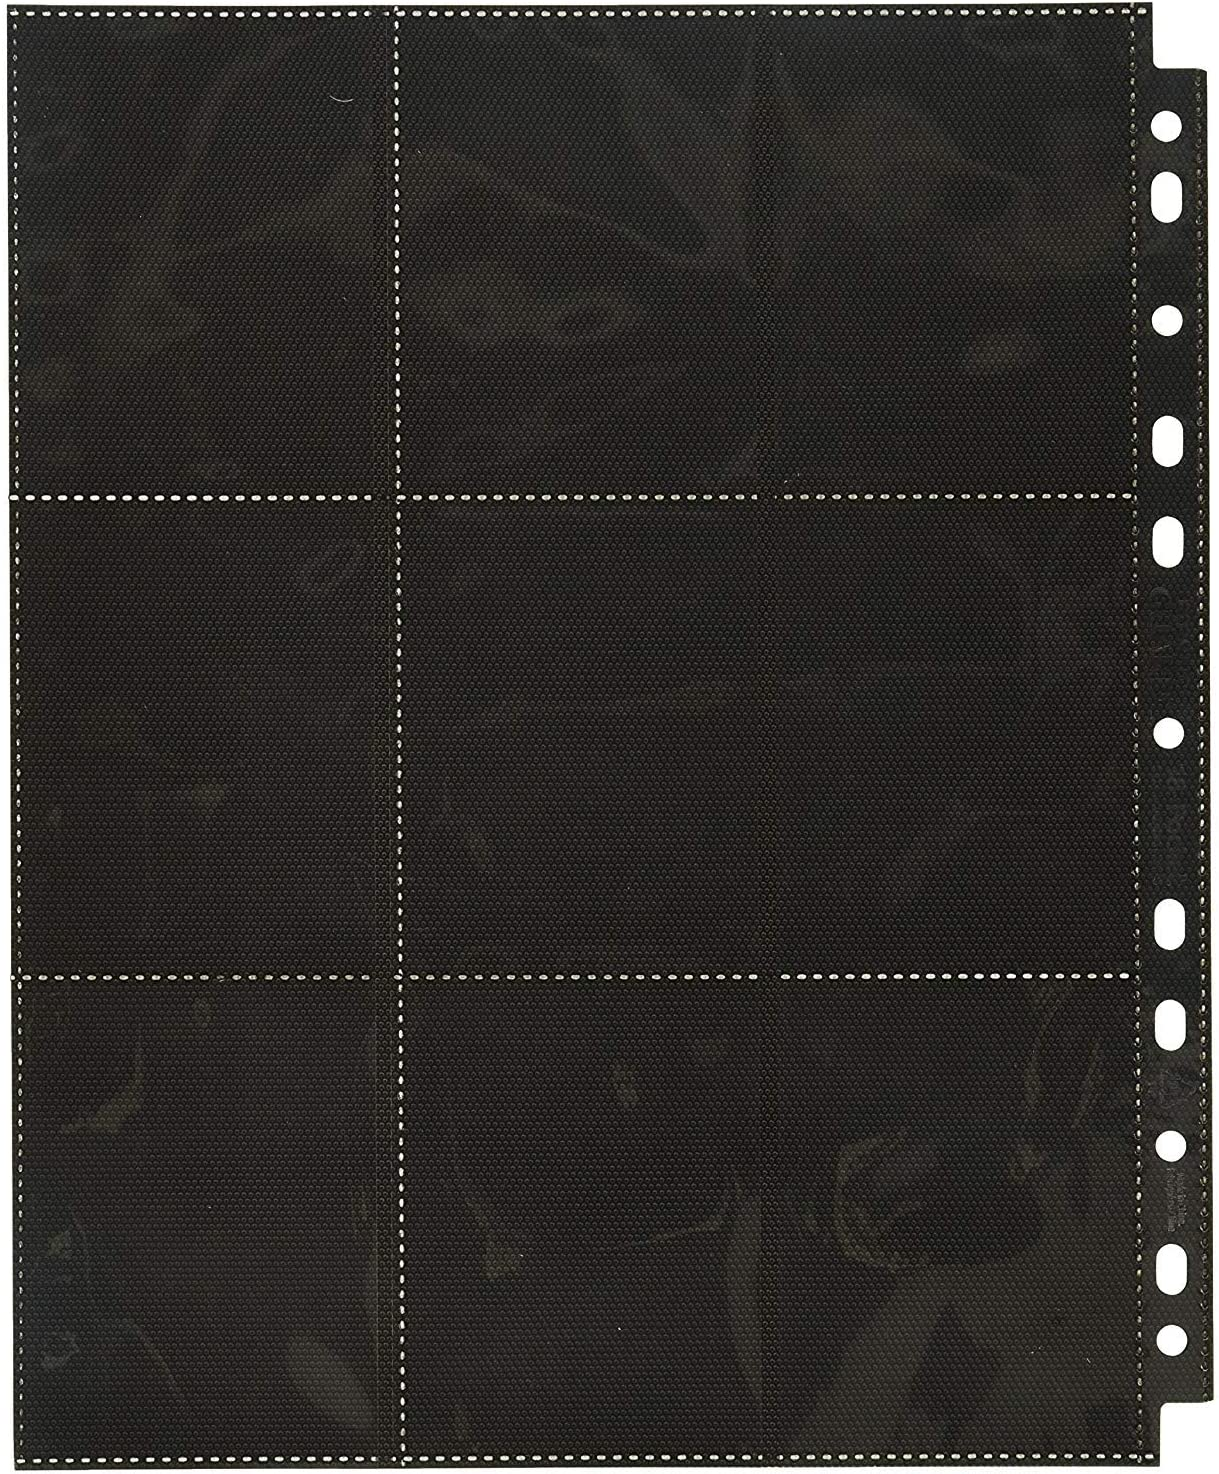 Details about  /10 BCW GAMING SIDE LOADING 18-POCKET PRO BINDER PAGES